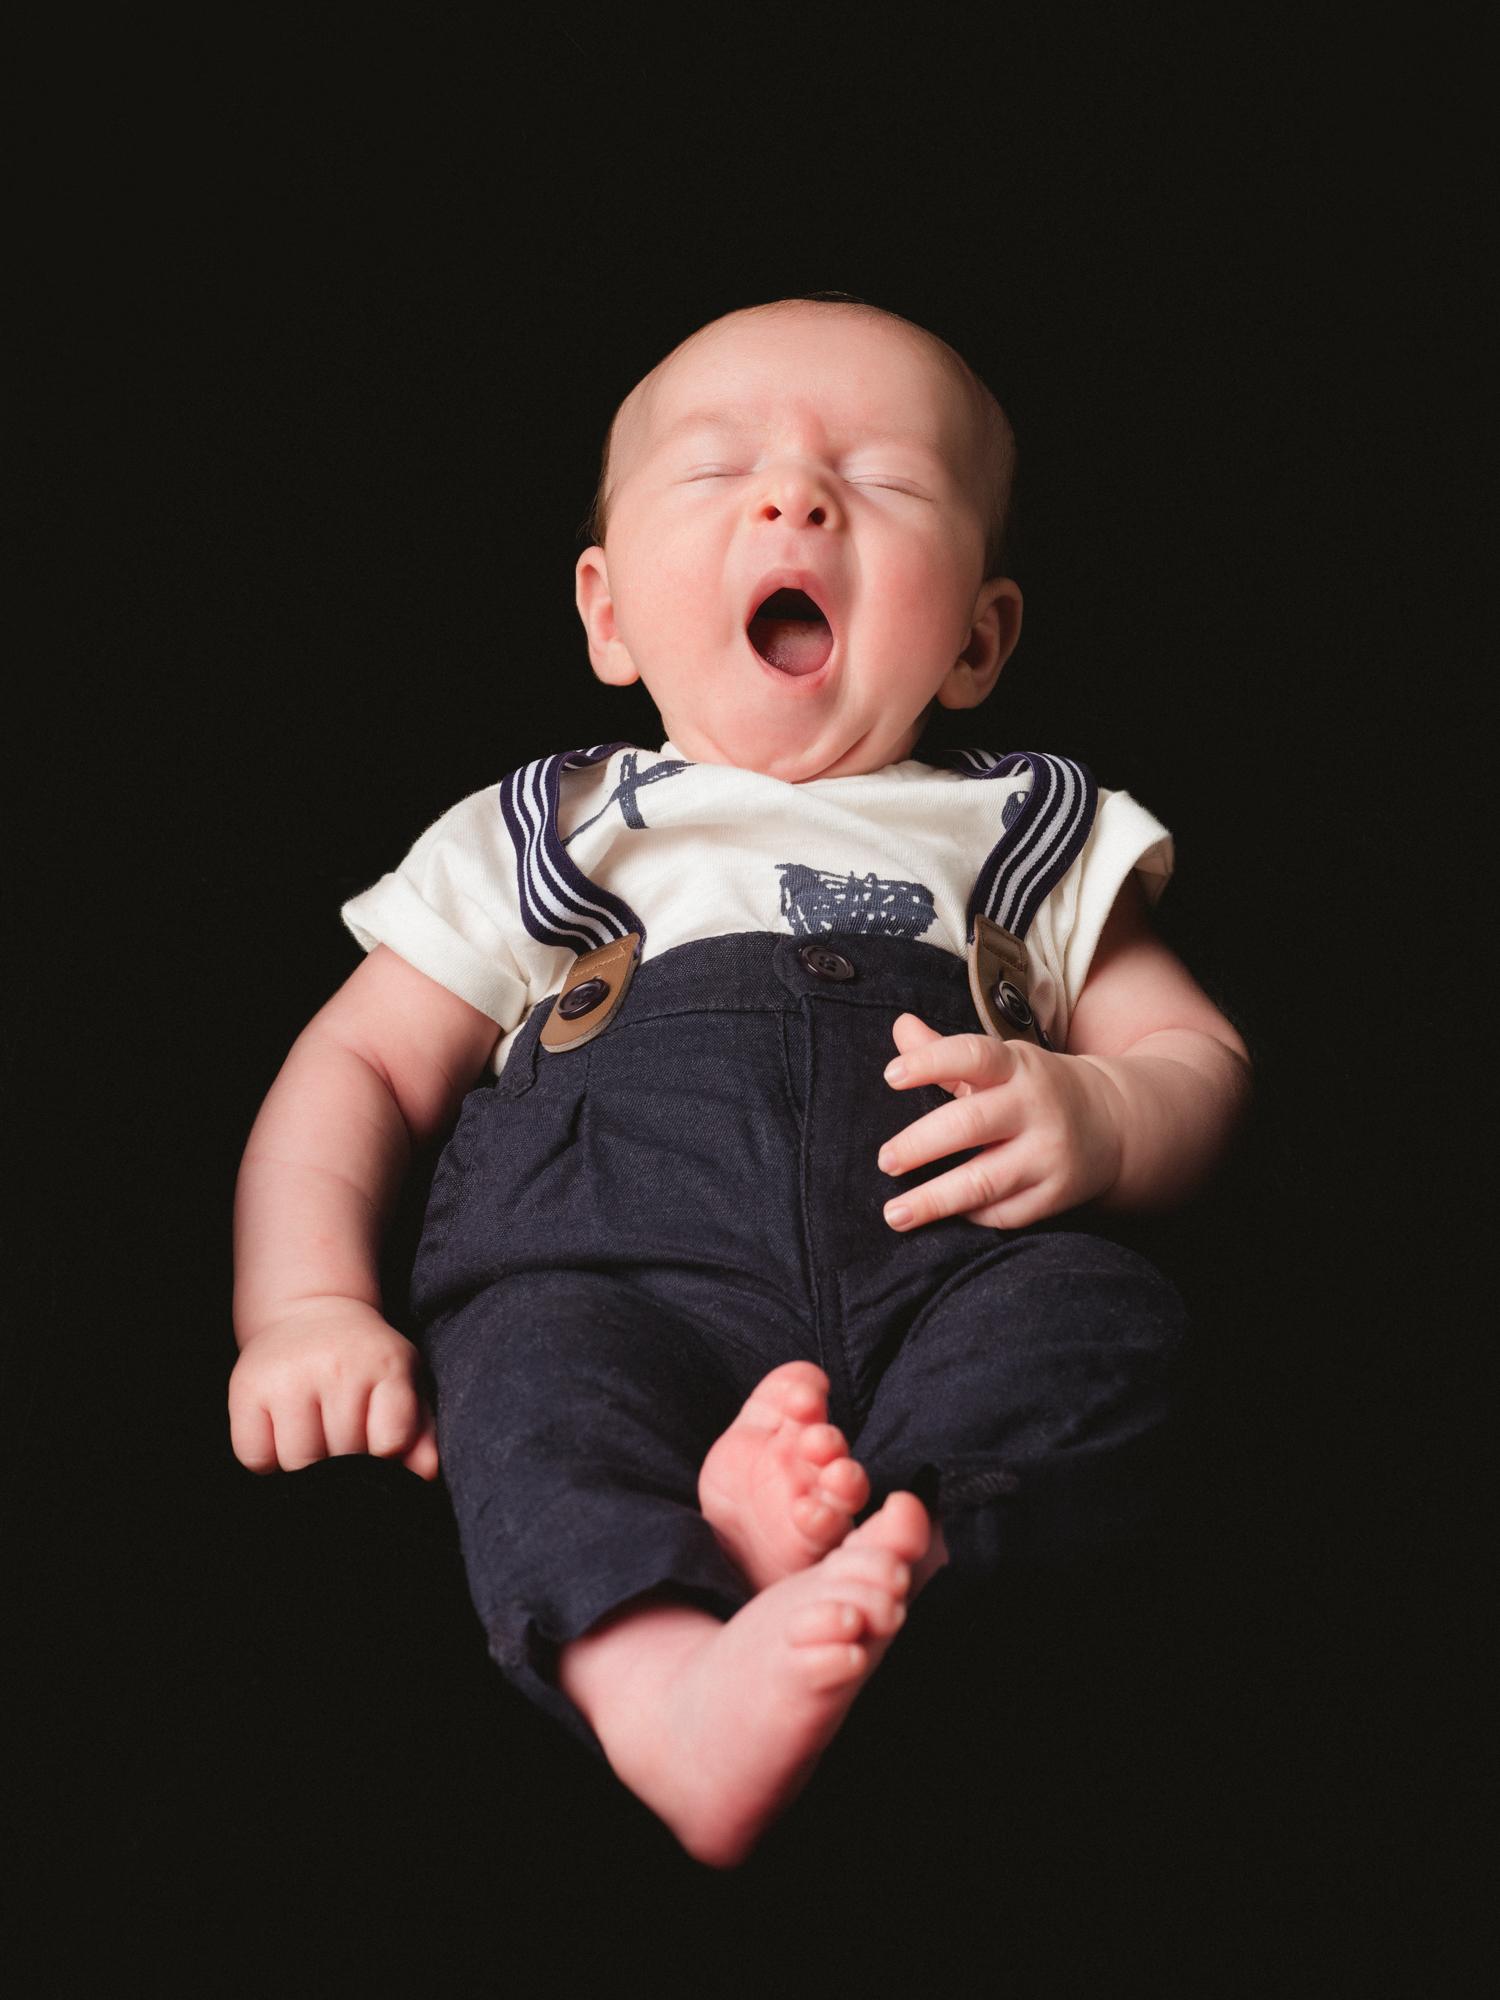 Newborn-baby-Arlo-003.jpg